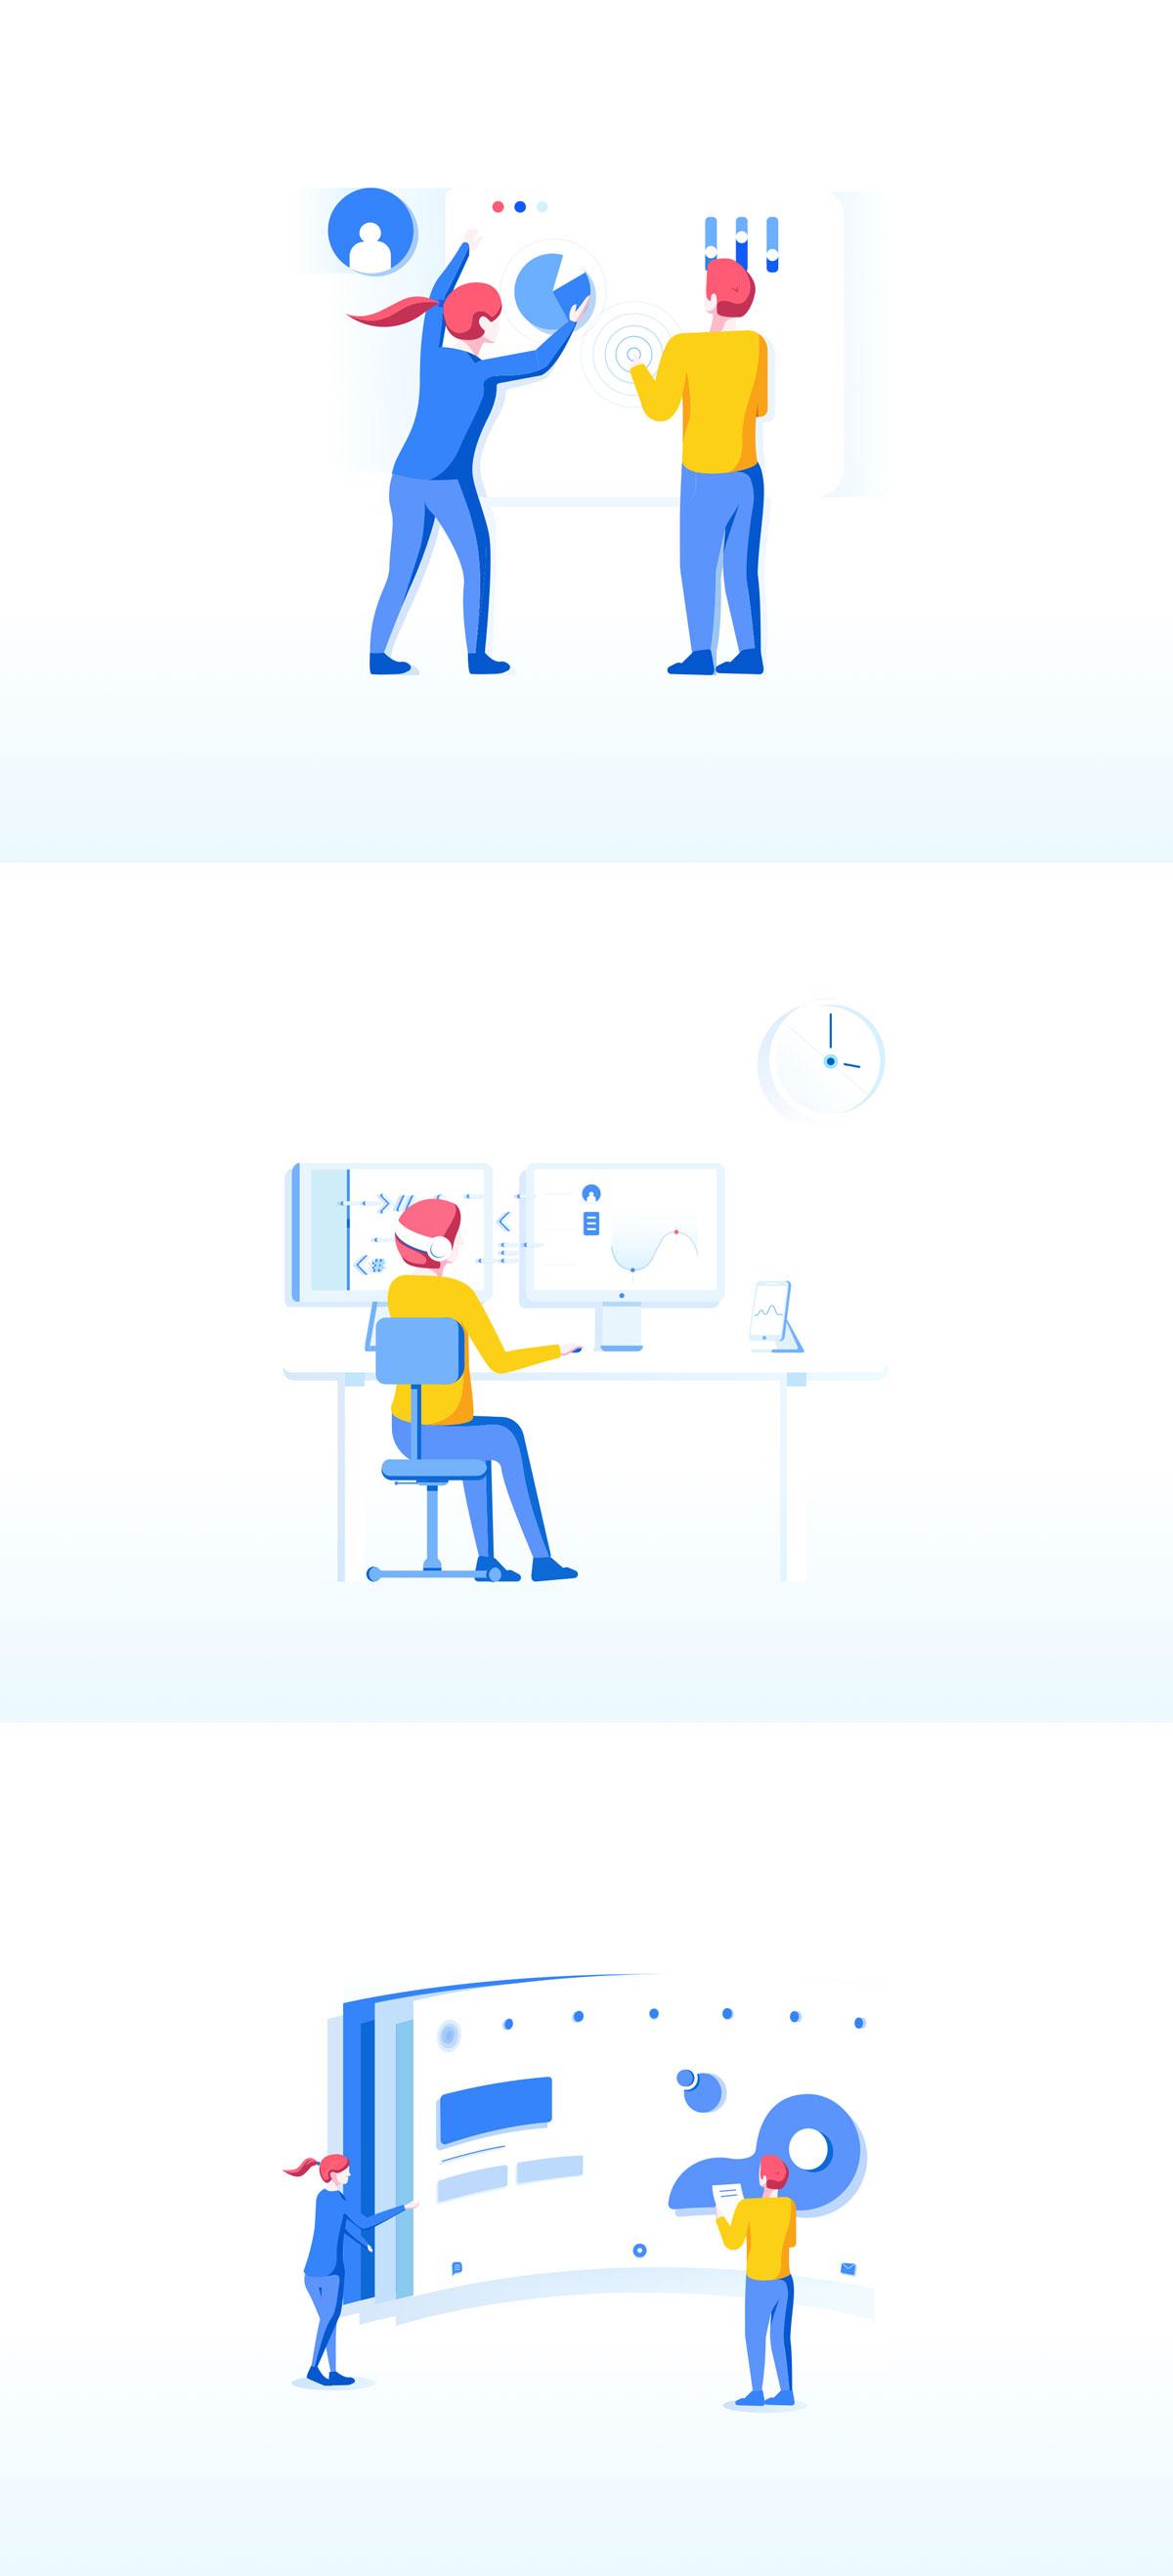 精心设计的团队合作和协作EPS矢量插图 Teamwork & Collaboration Illustrations插图(8)